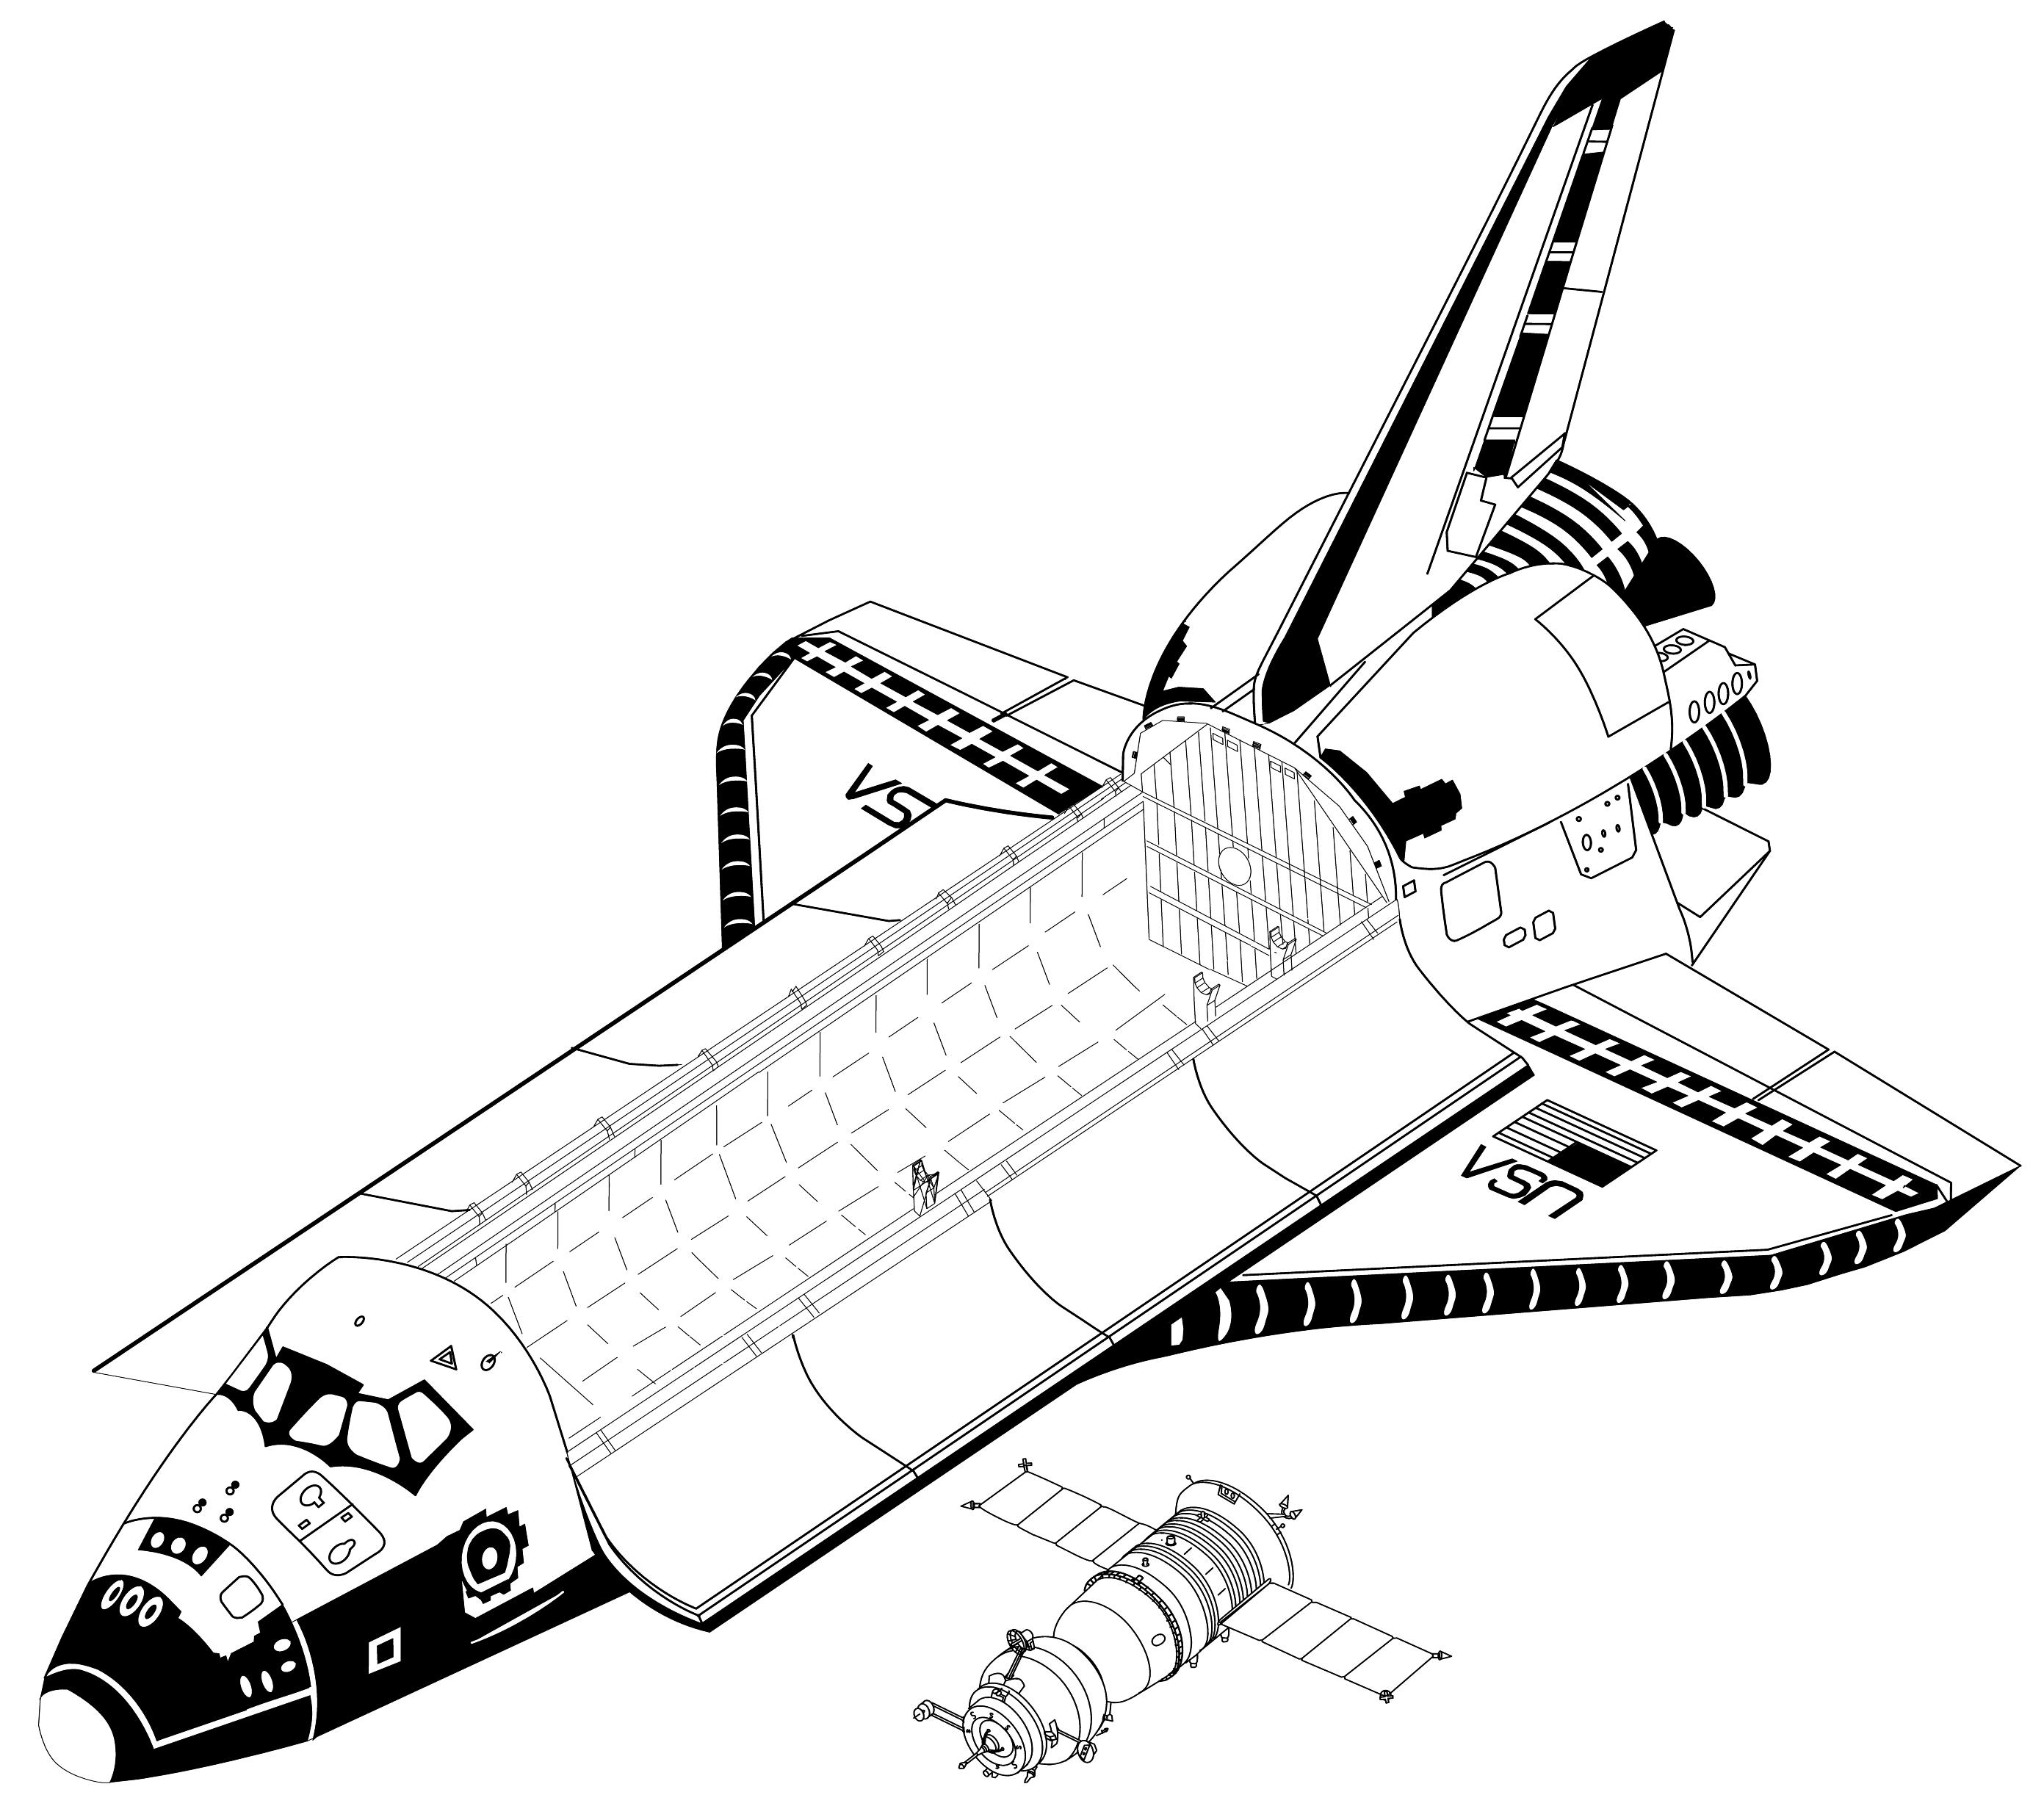 2783x2459 FileSpace Shuttle vs Soyuz TM